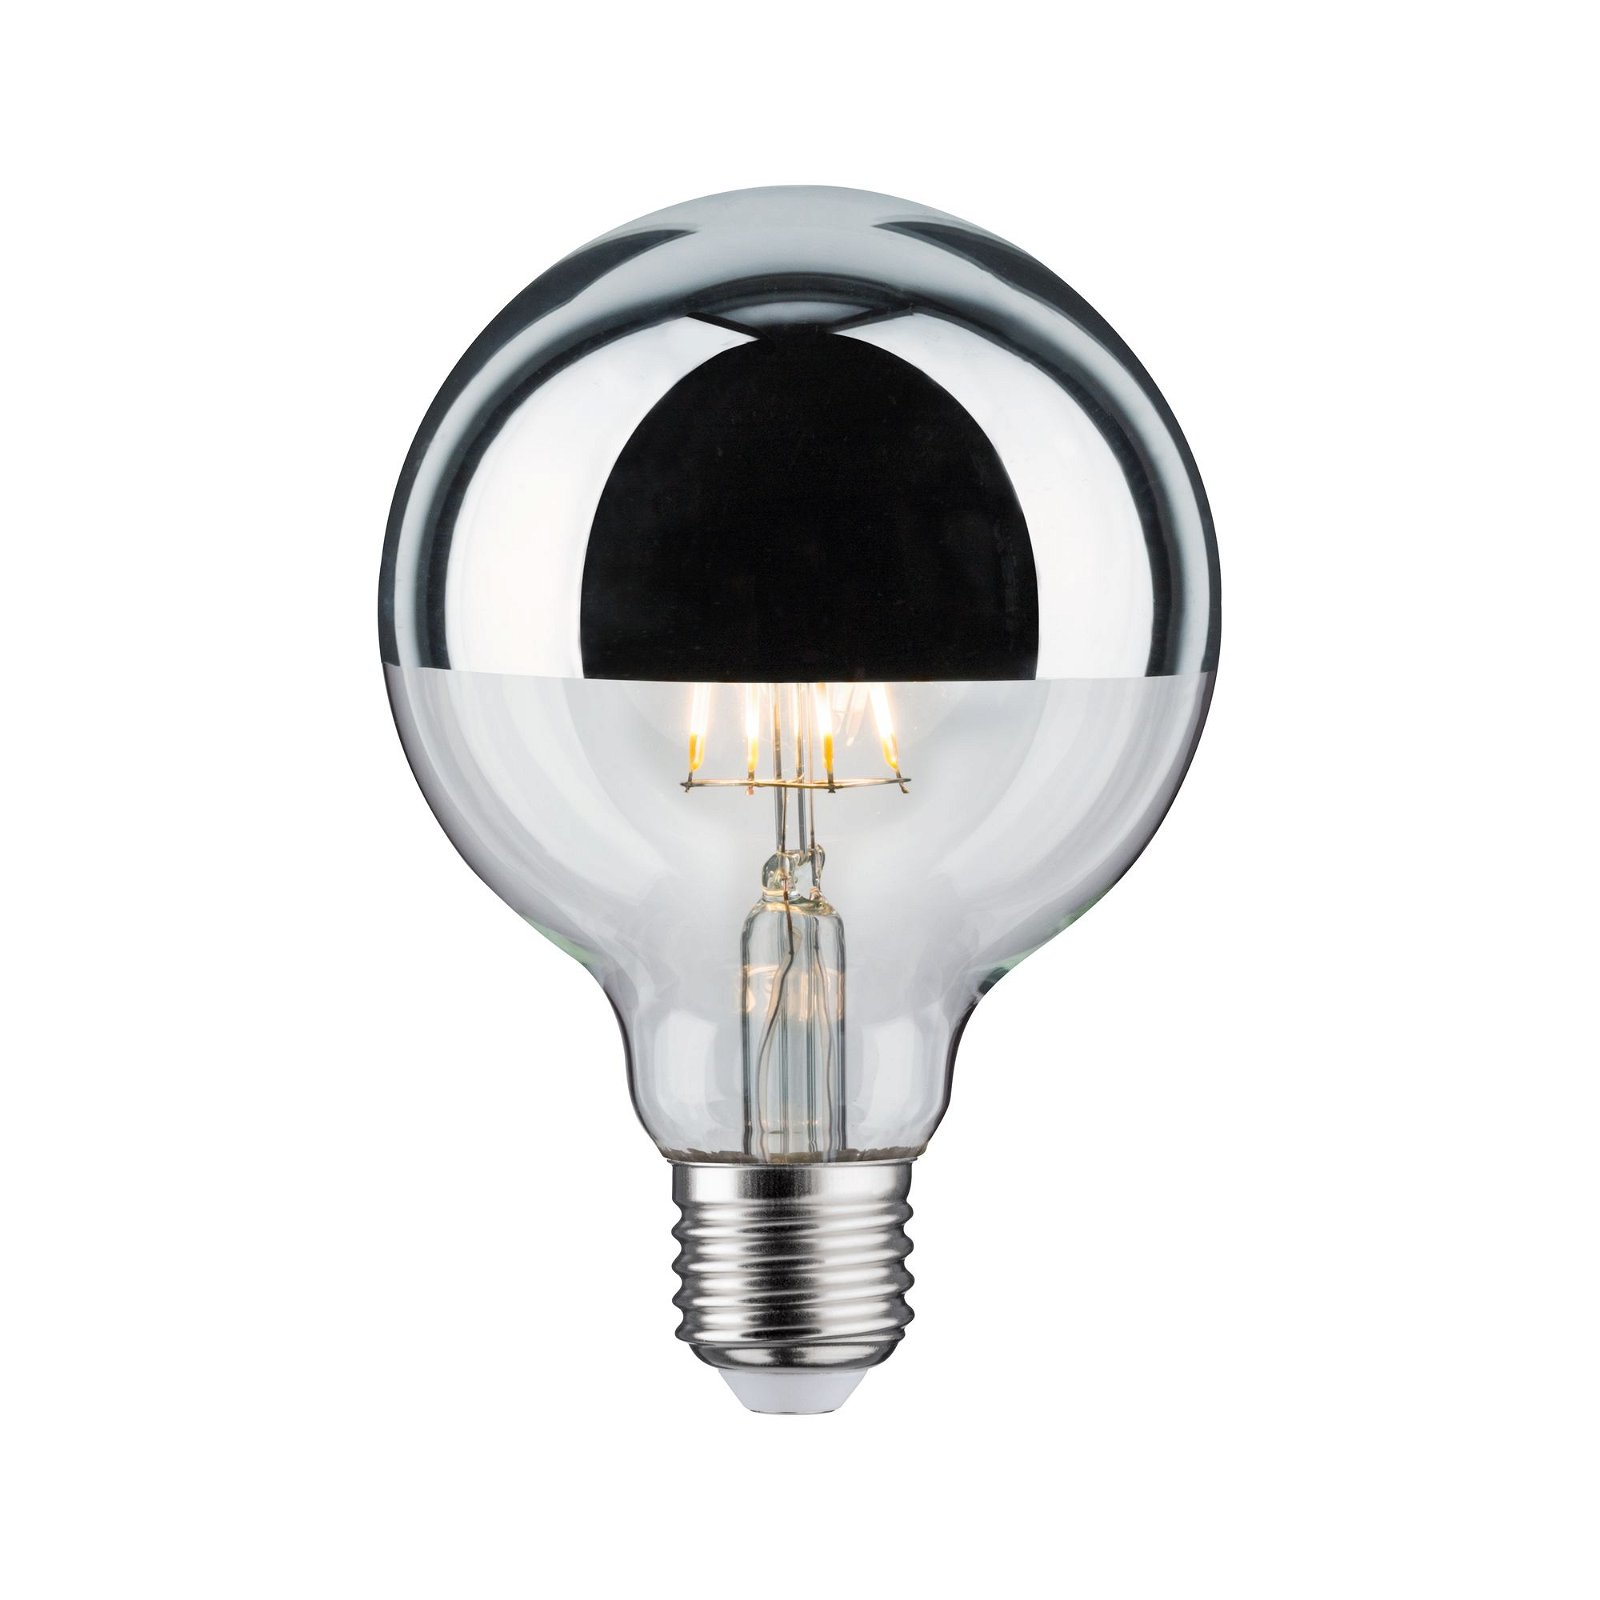 Modern Classic Edition LED Globe Kopfspiegel E27 230V 600lm 6,5W 2700K Kopfspiegel Silber